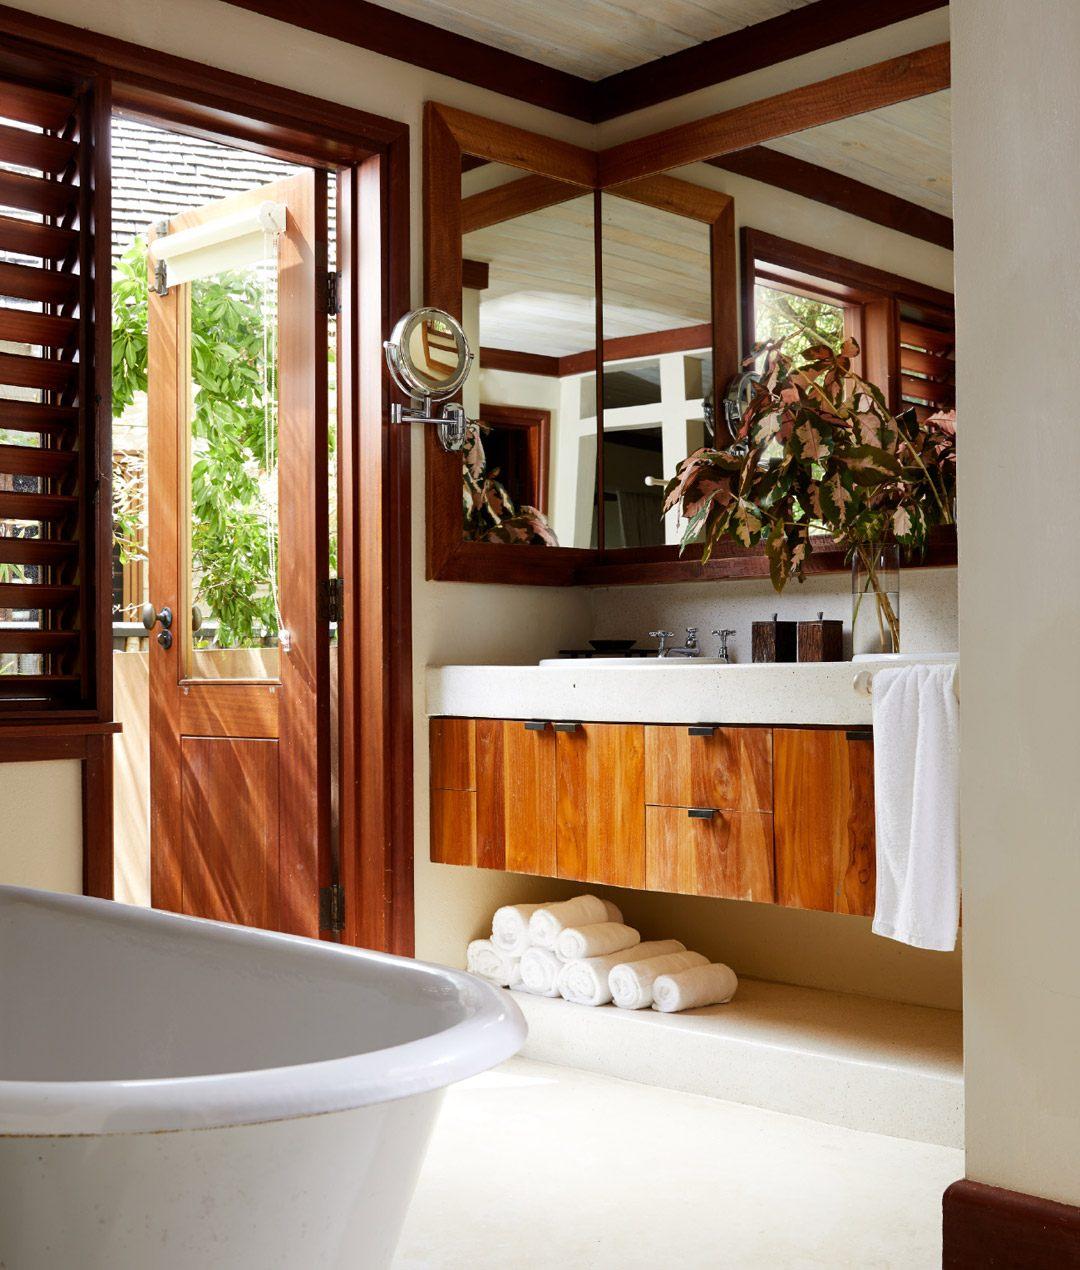 7-one-bedroom-beach-villa-carousel-2